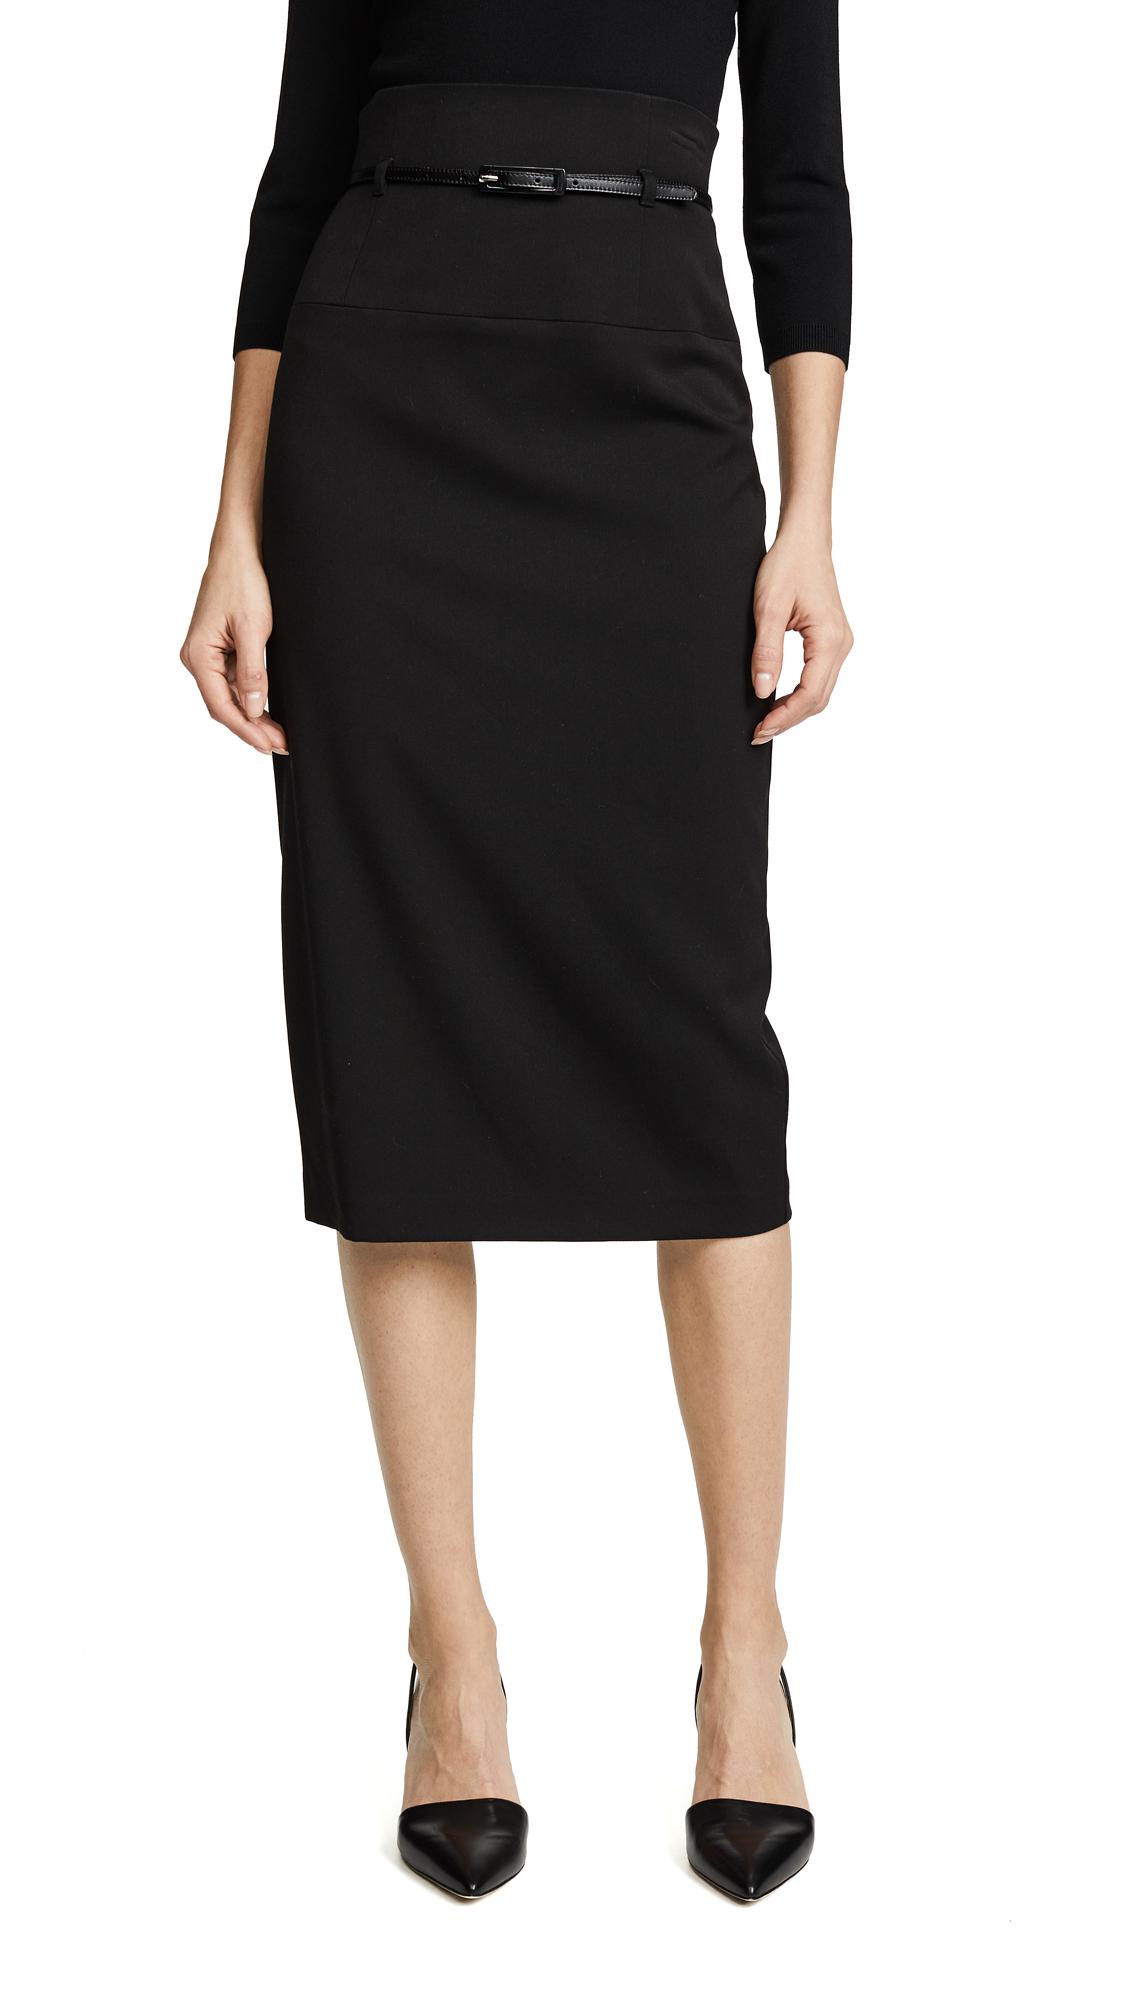 Black Halo High Waisted Pencil Skirt - Black